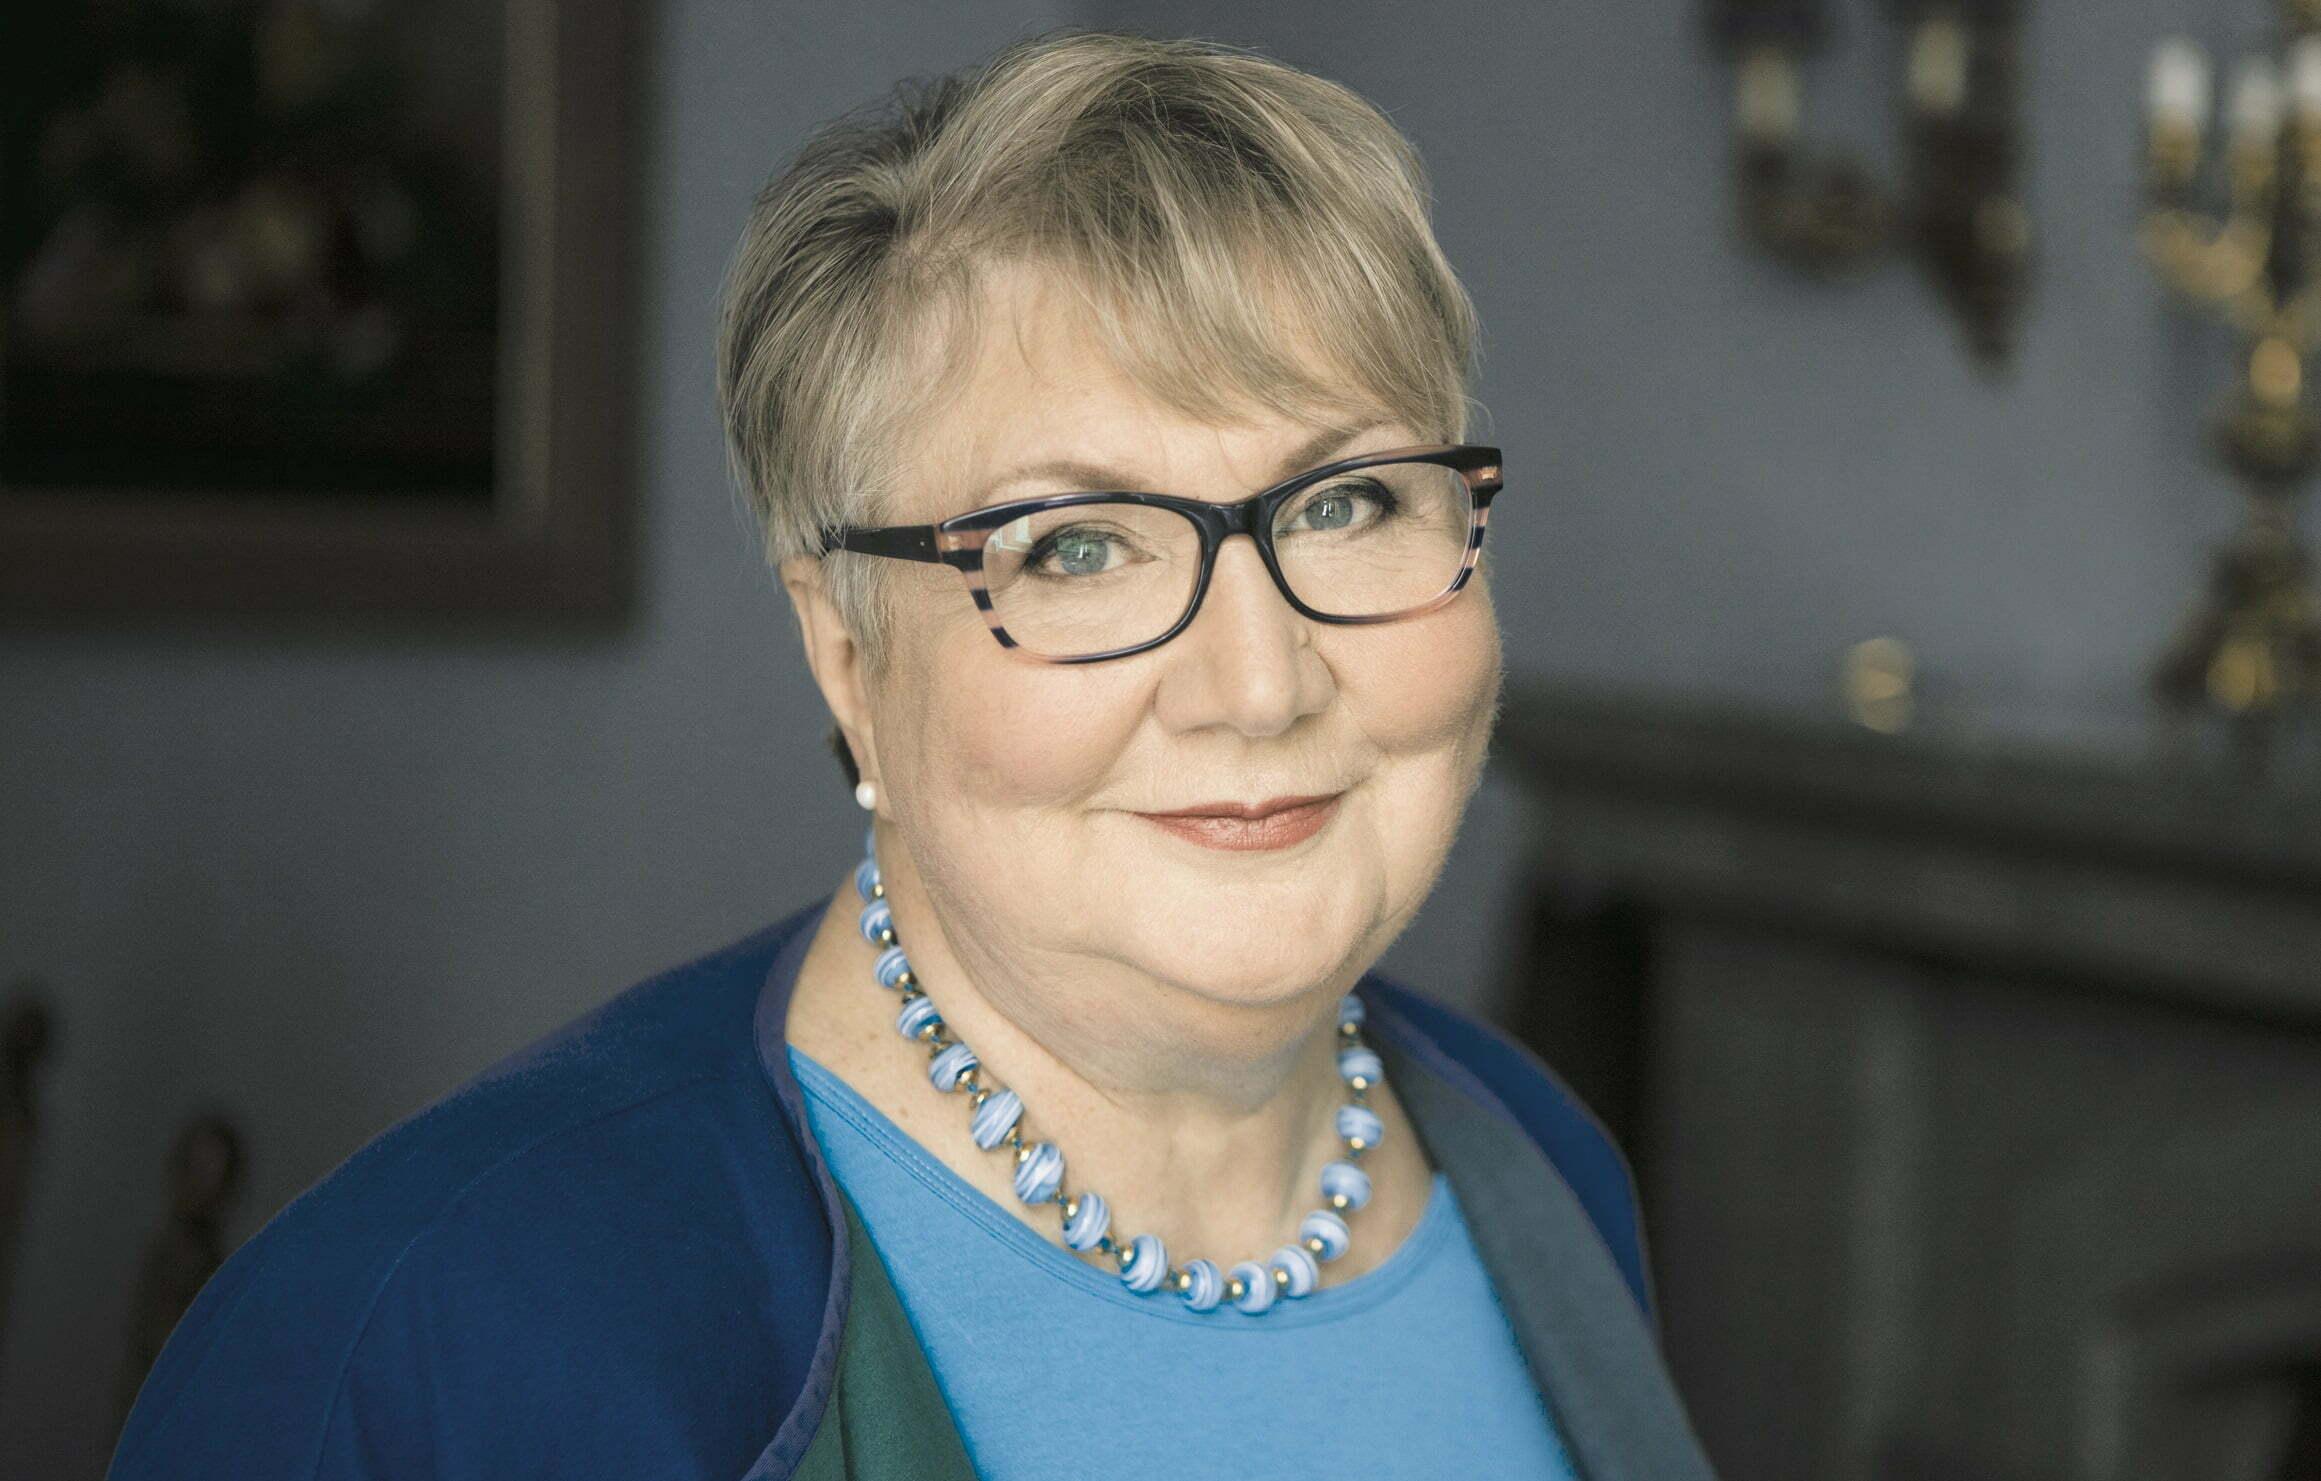 Anneli Kannon kirjailijakuva 2016, kuvaaja Marek Sabogal